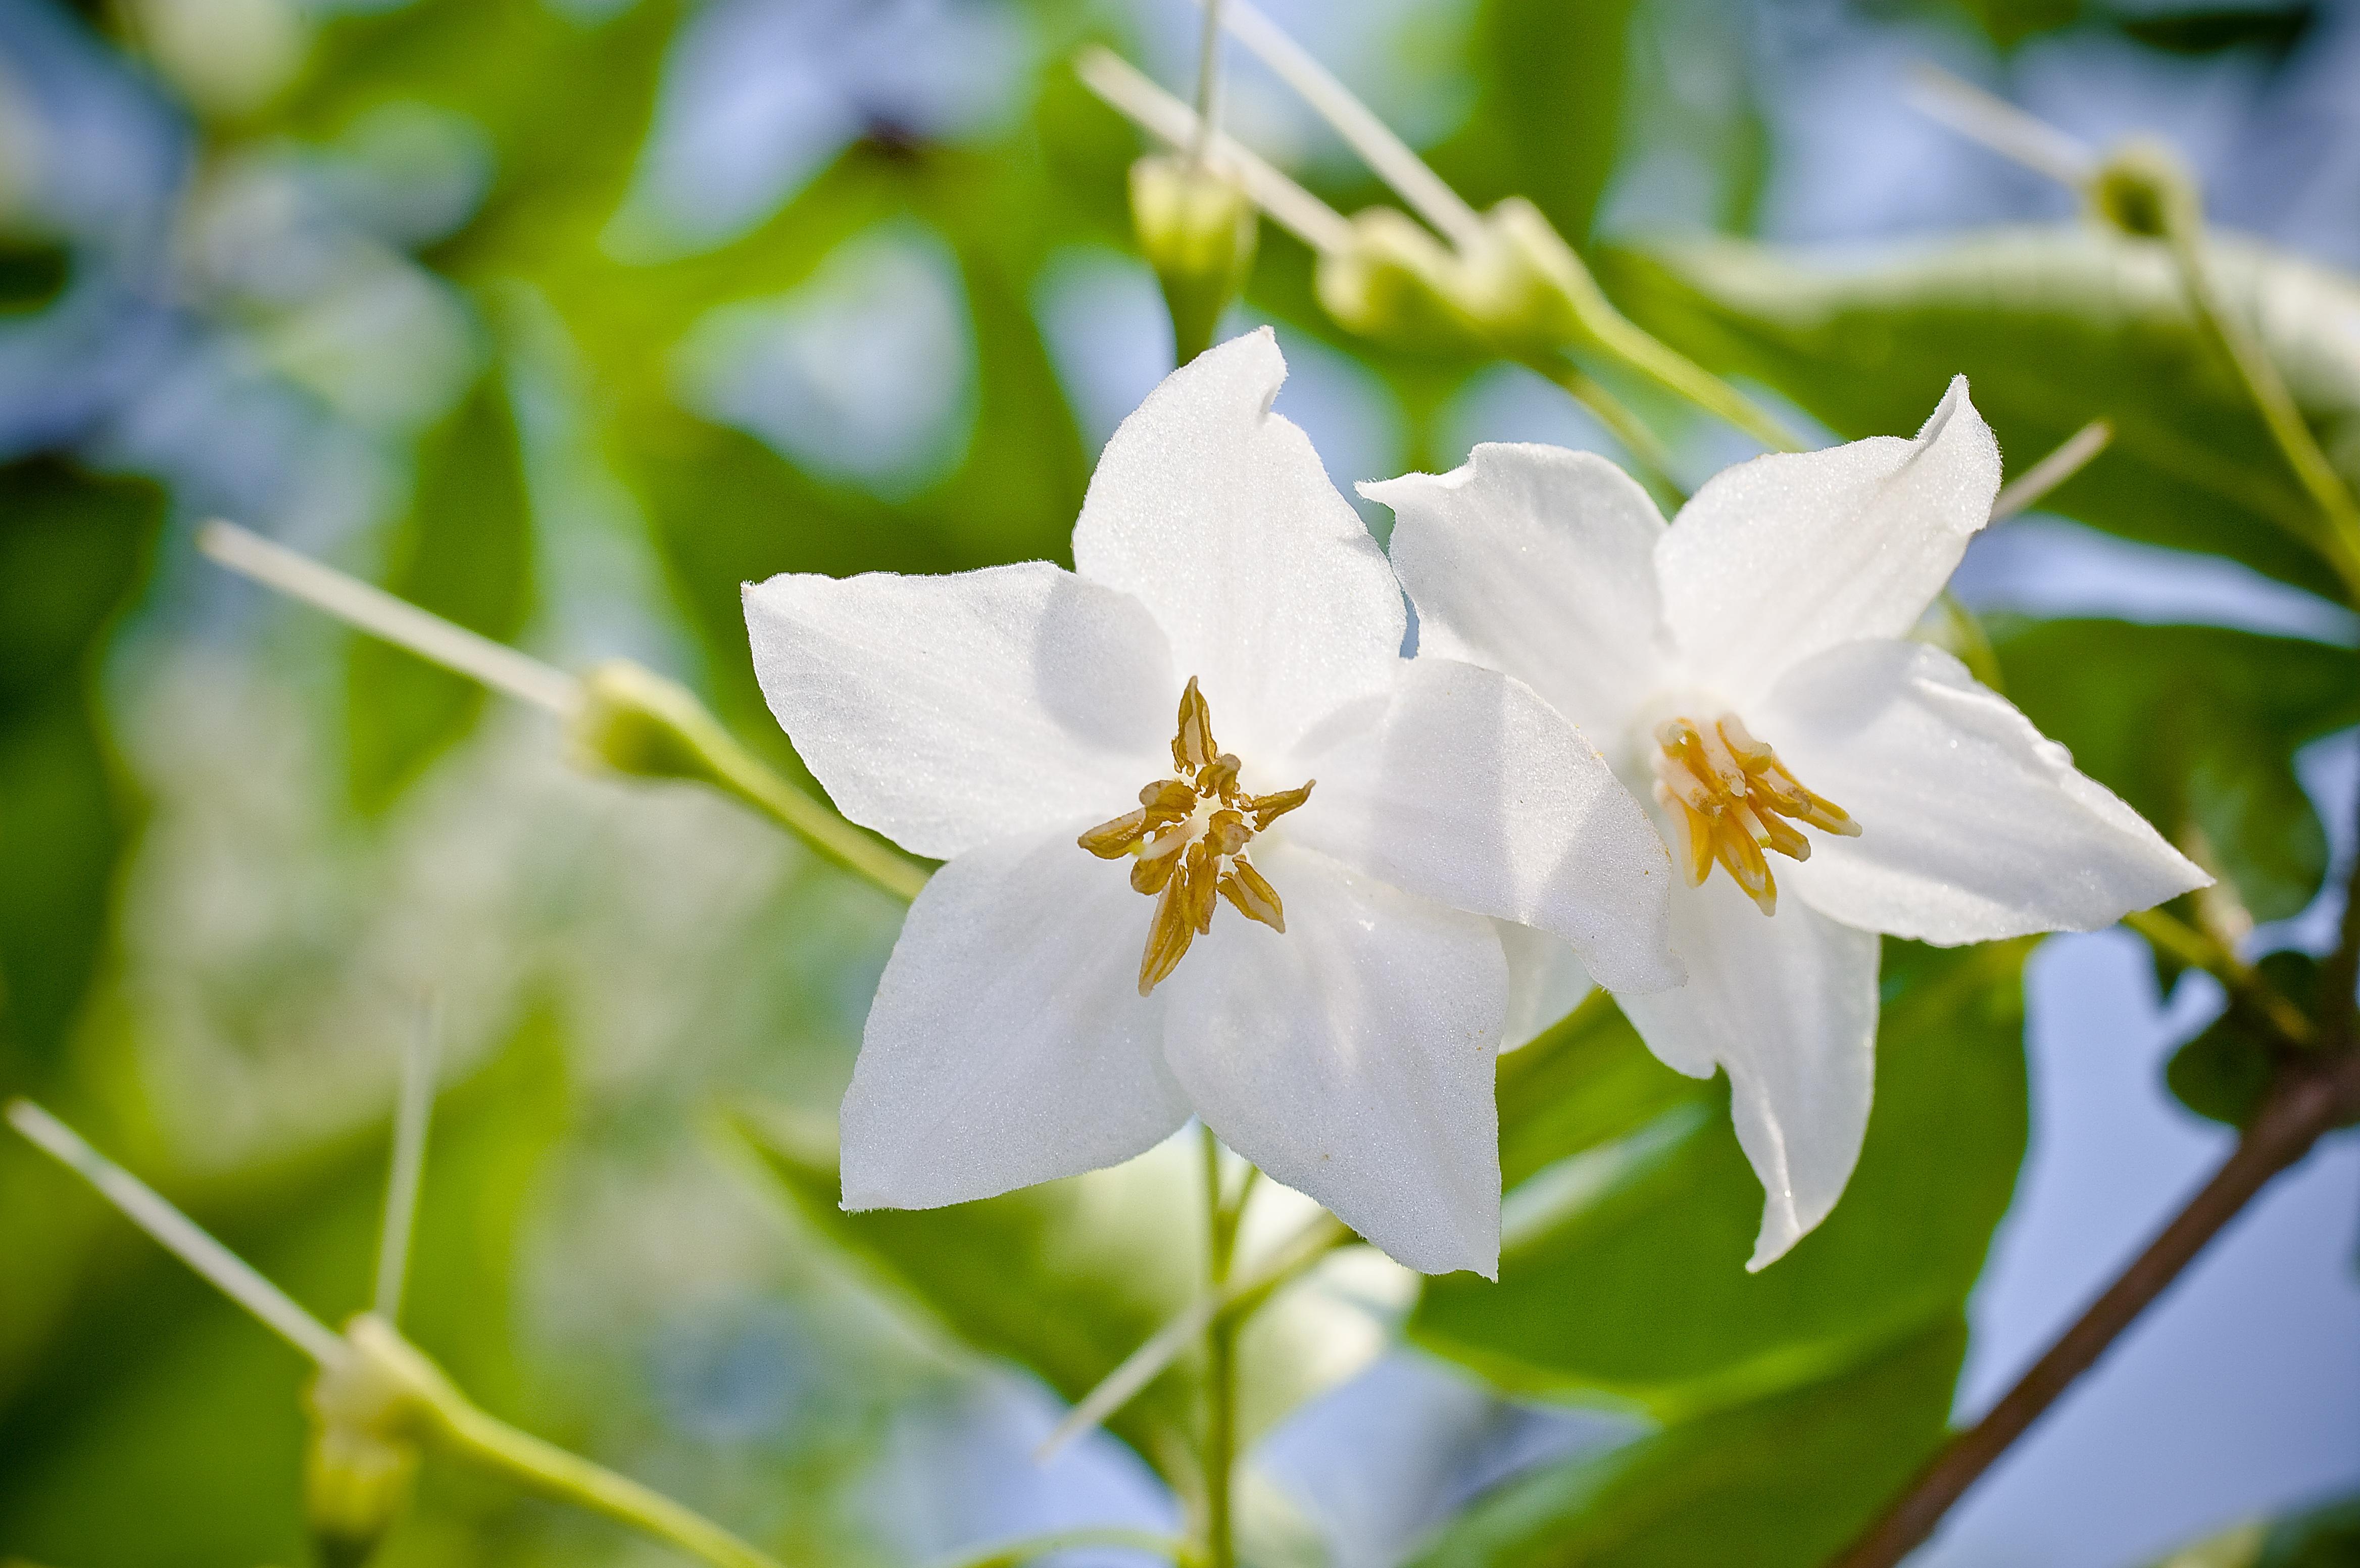 Free Images Nature Branch Blossom Sunlight Petal Autumn